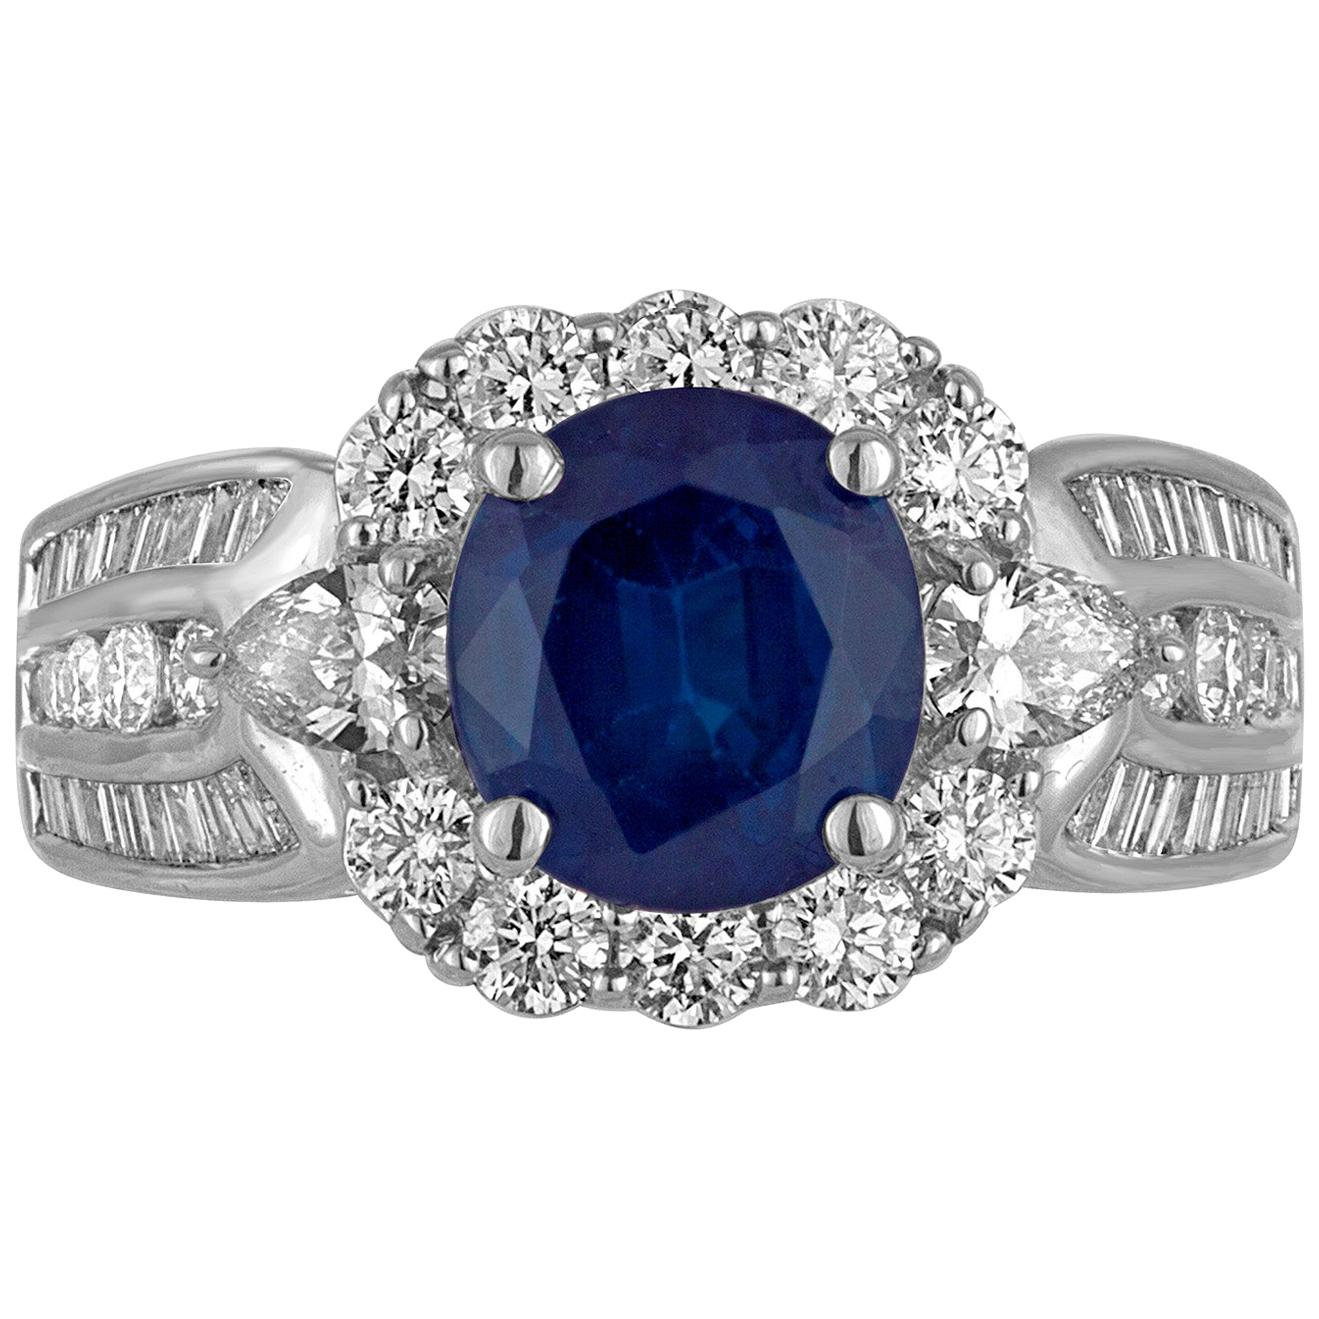 Art Deco Style Blue Sapphire Oval White Diamond Halo Gold Fashion Cocktail Ring